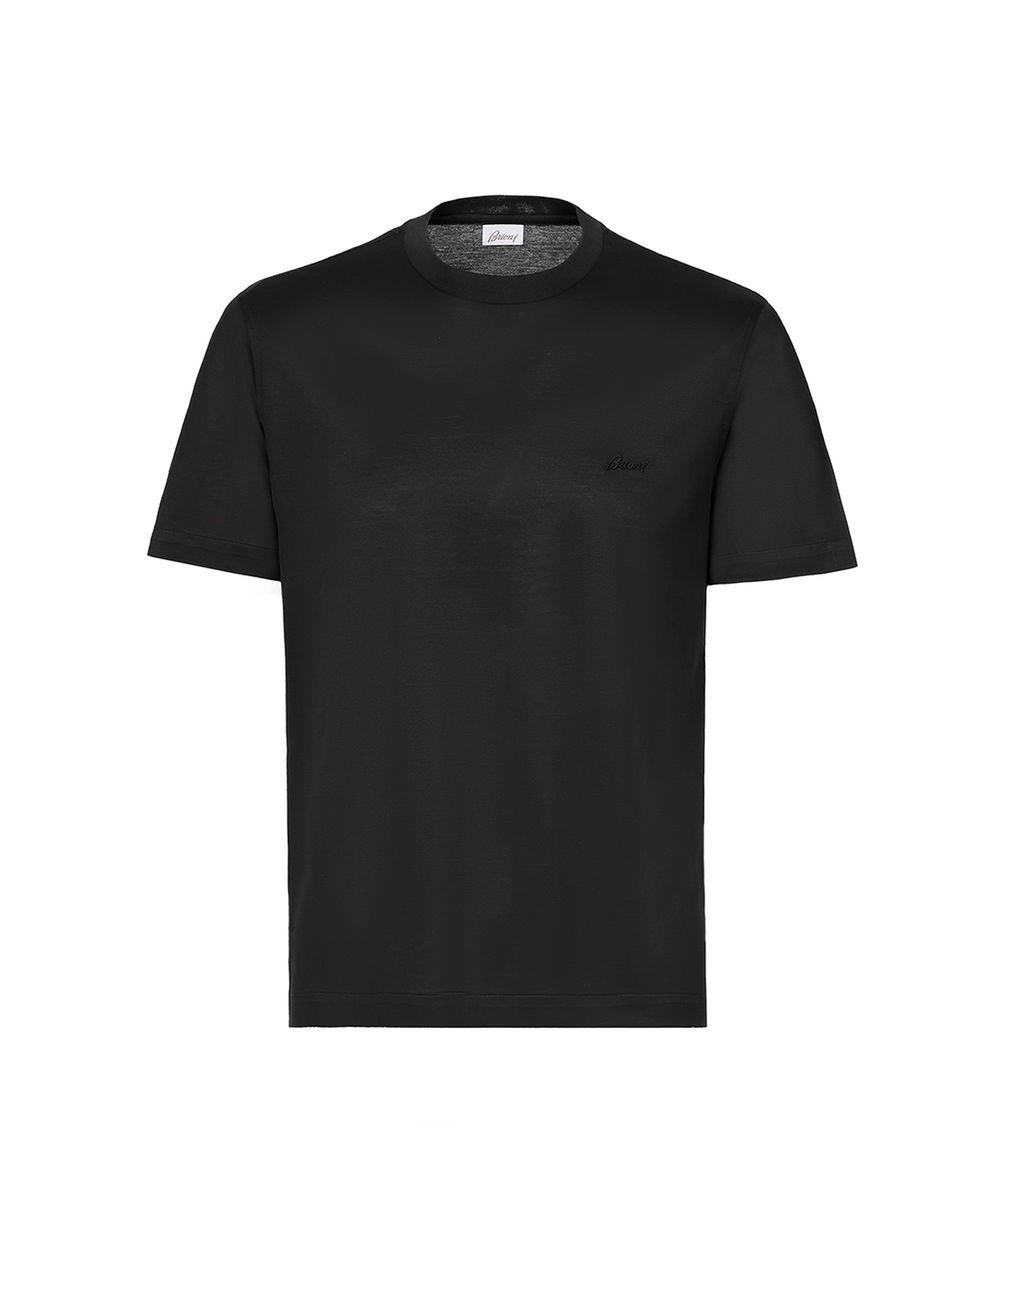 BRIONI Black Logoed T-Shirt T-shirts & polos Homme f